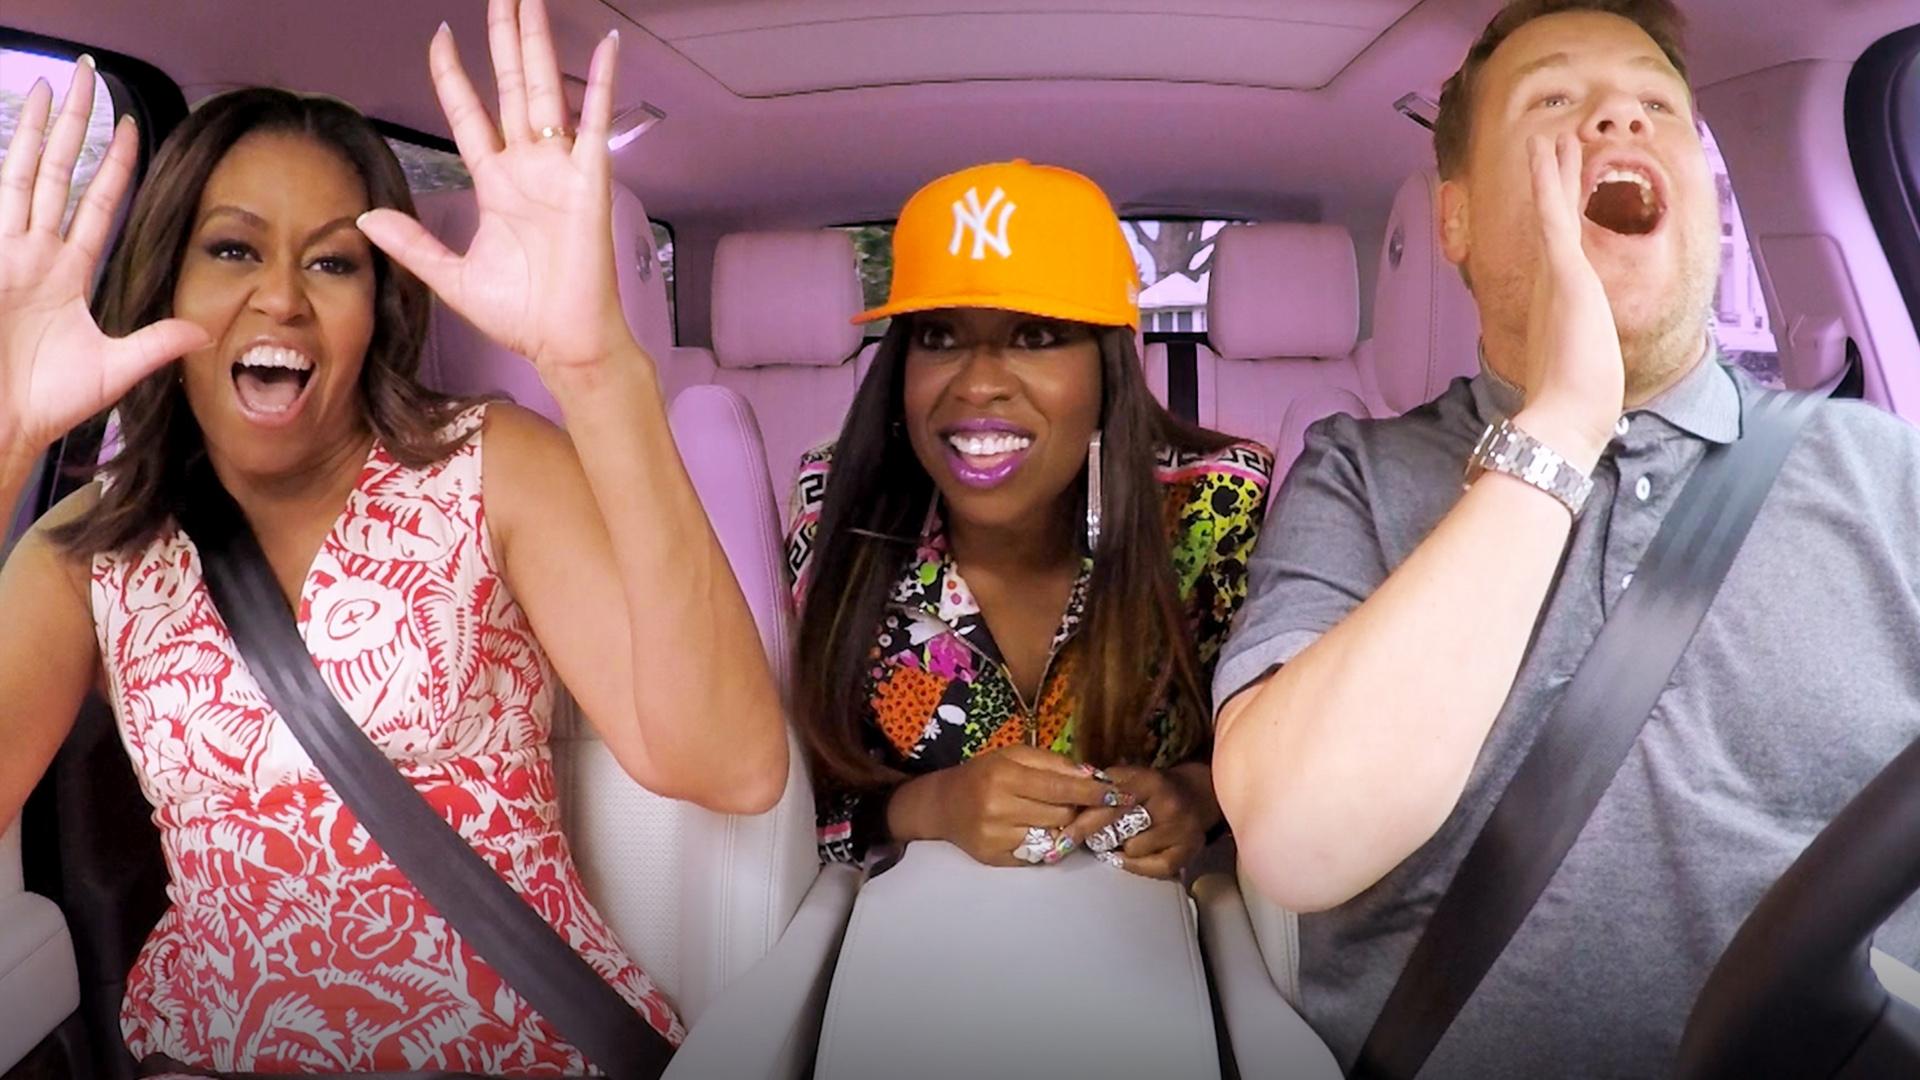 ICYMI: Michelle Obama On Carpool Karaoke [VIDEO]